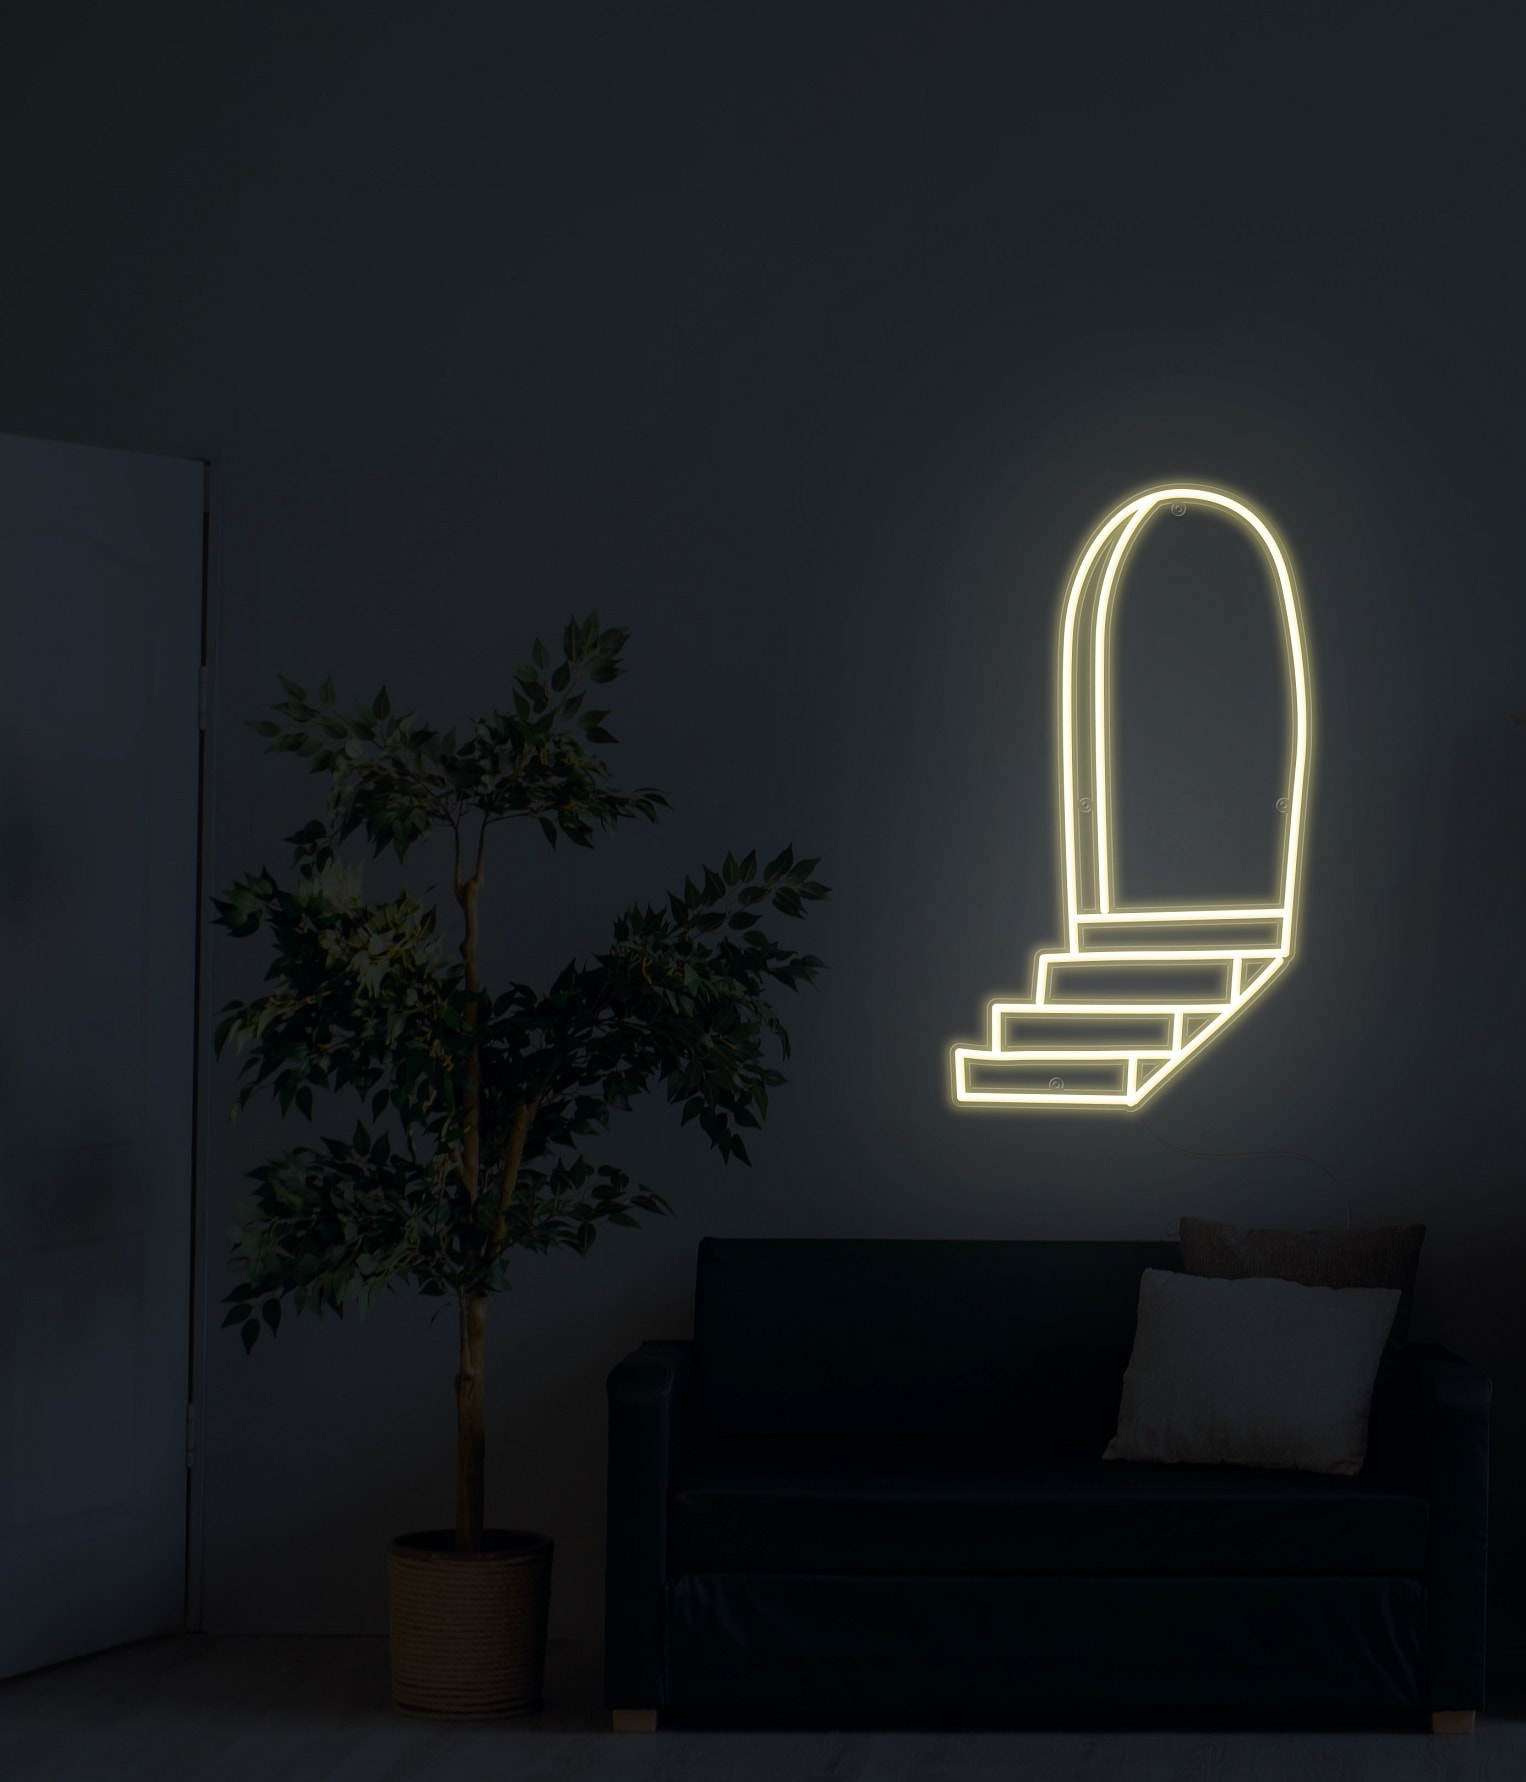 Grand Entrance neon light